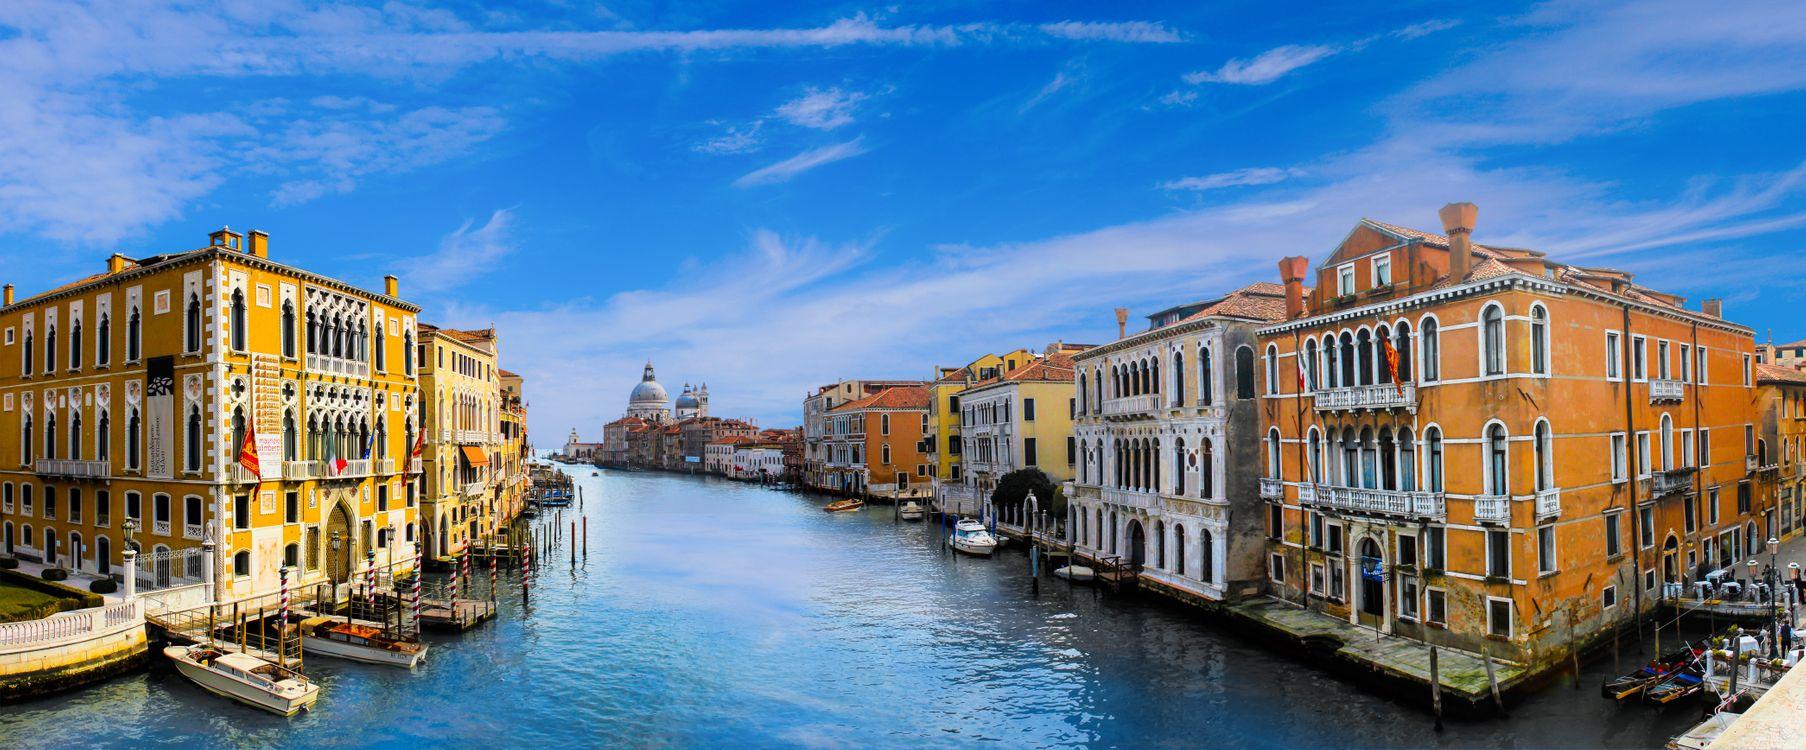 Фото бесплатно Венеция, Италия, Гранд-канал в Венеции - на рабочий стол